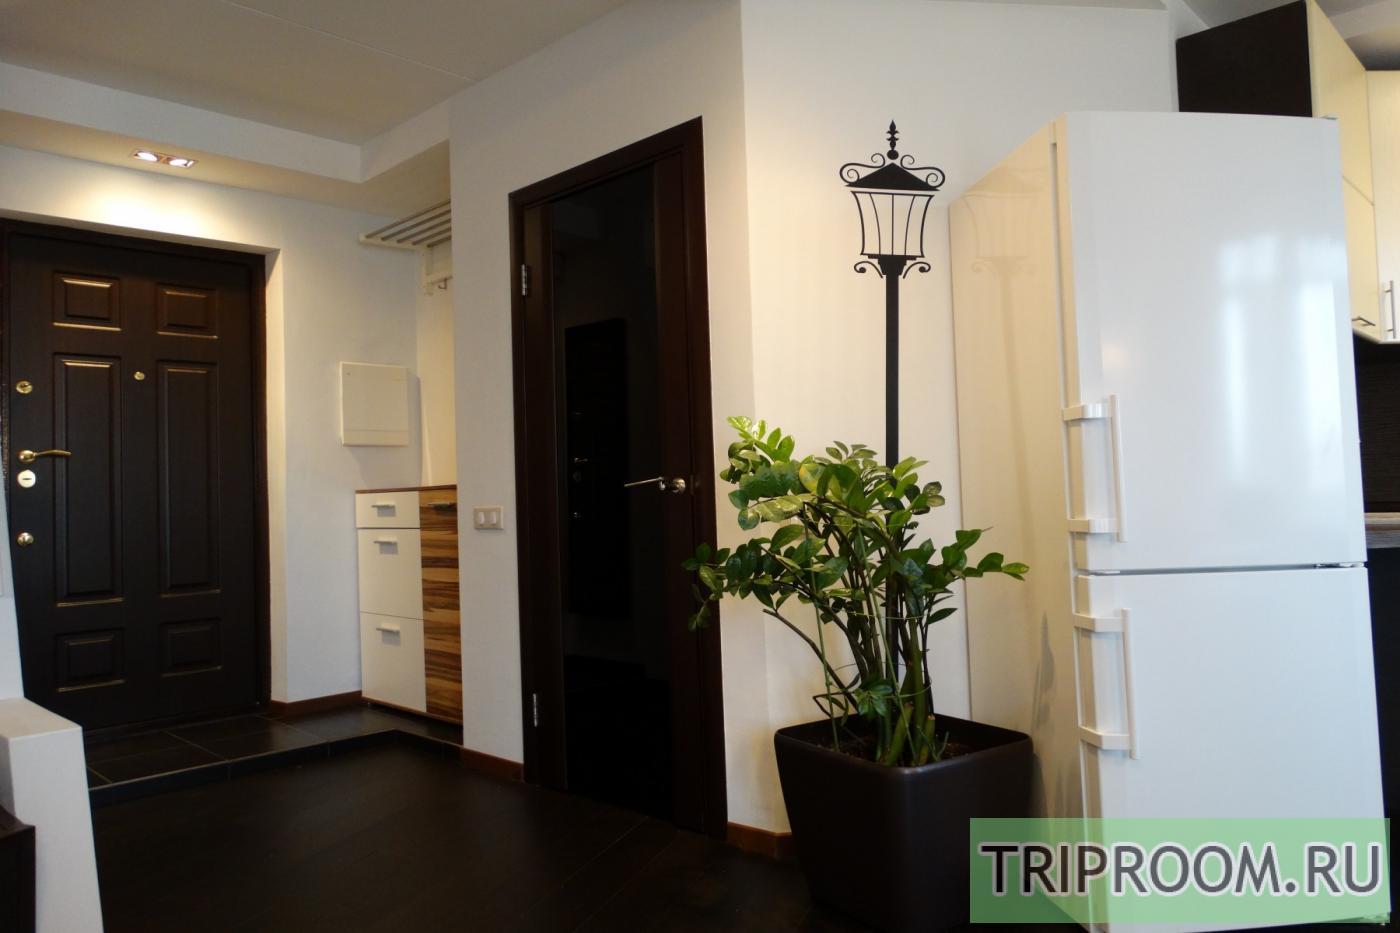 1-комнатная квартира посуточно (вариант № 22157), ул. Архитектора Власова улица, фото № 4